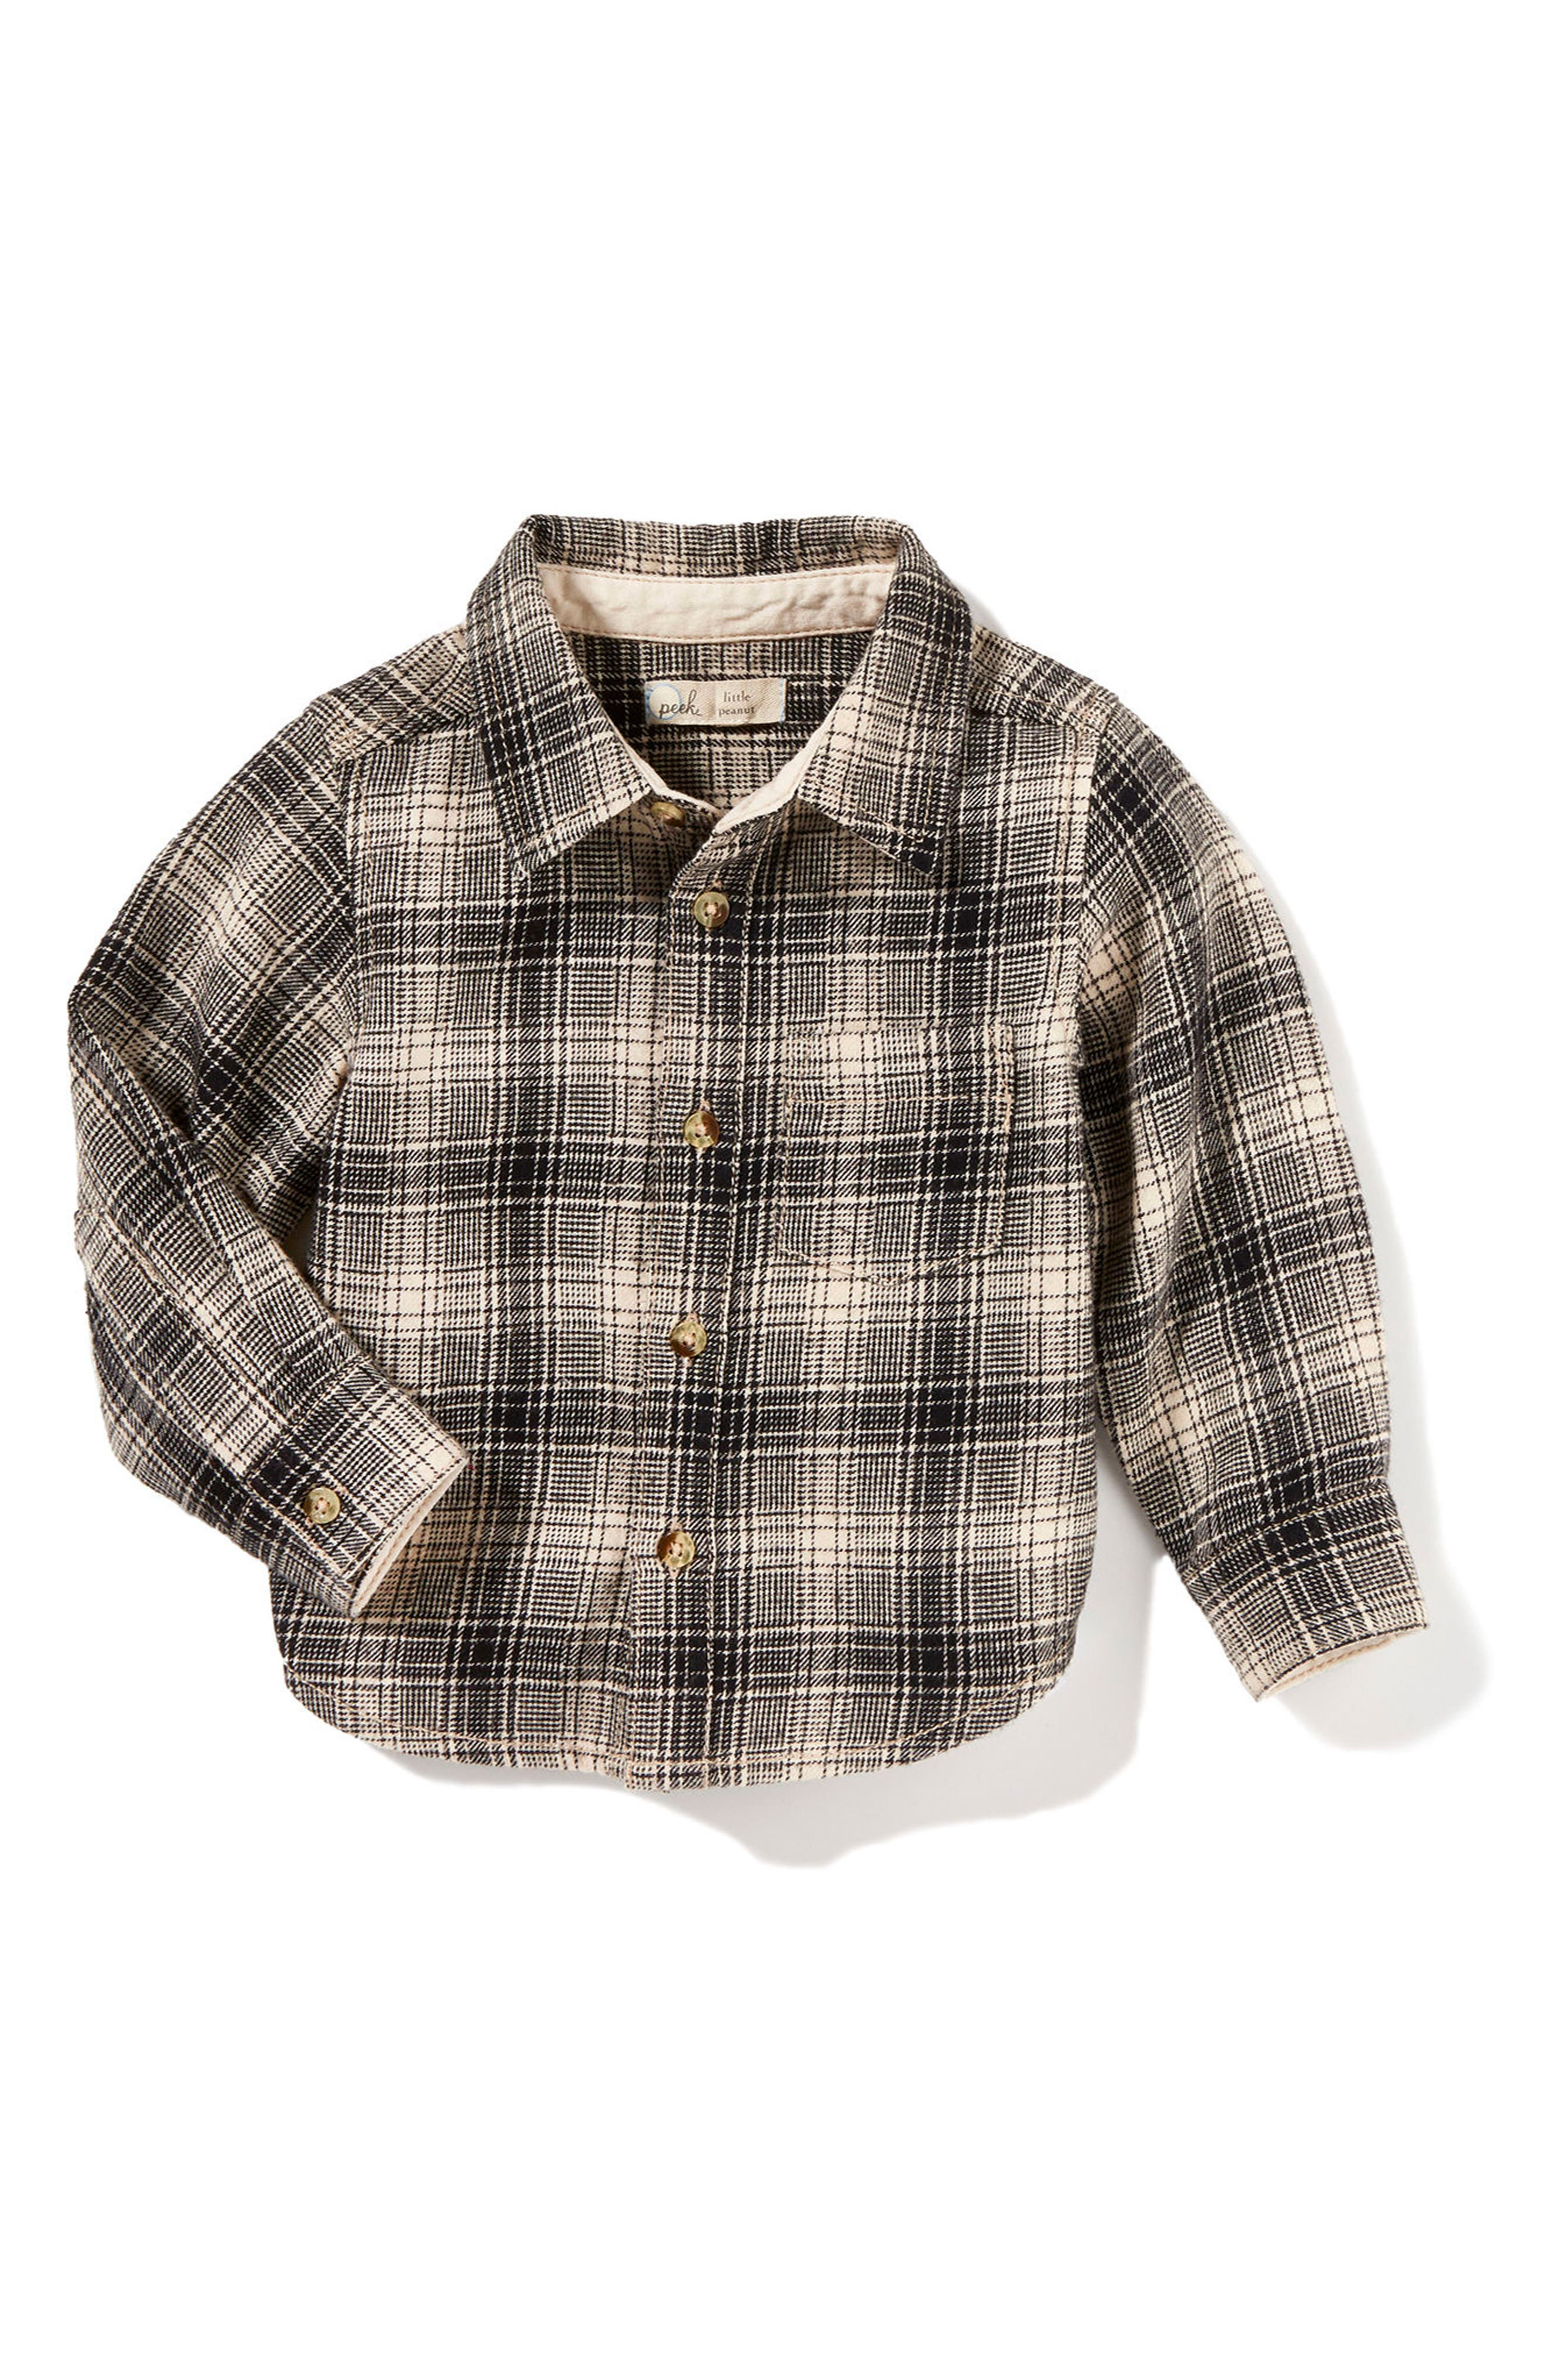 Mase Plaid Shirt,                             Main thumbnail 1, color,                             Black